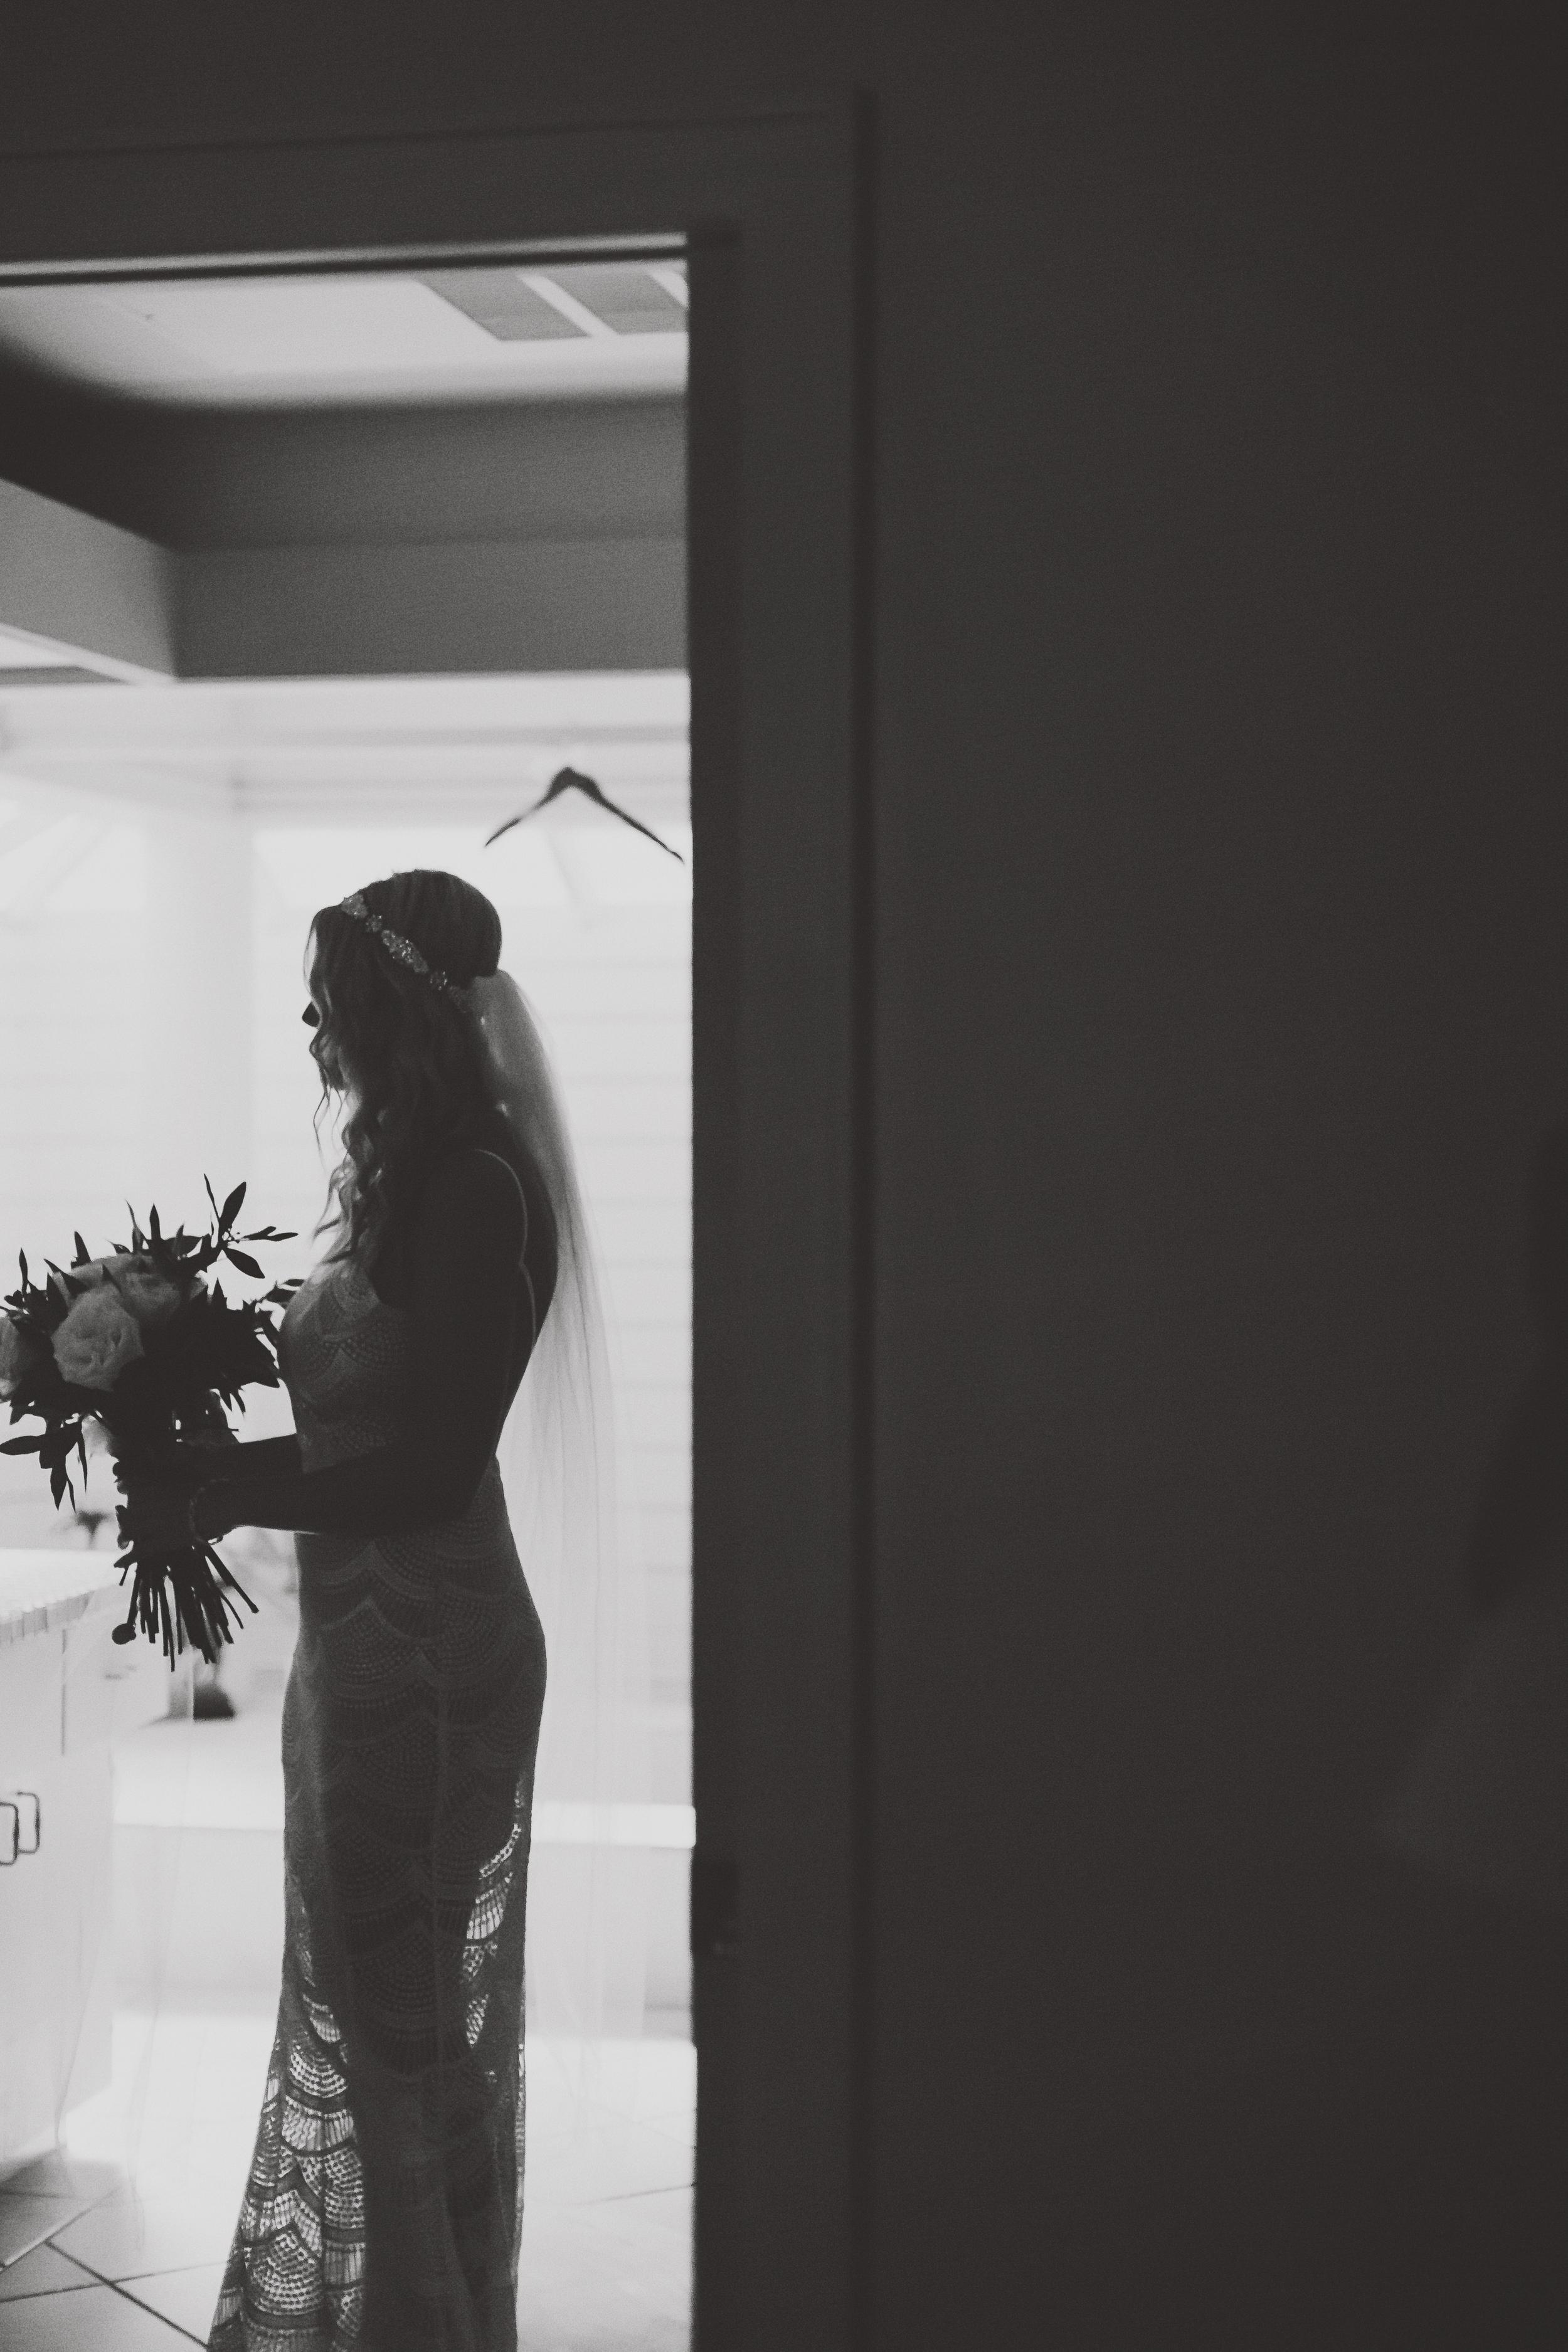 angie-diaz-photography-hawaii-wedding-10.jpg